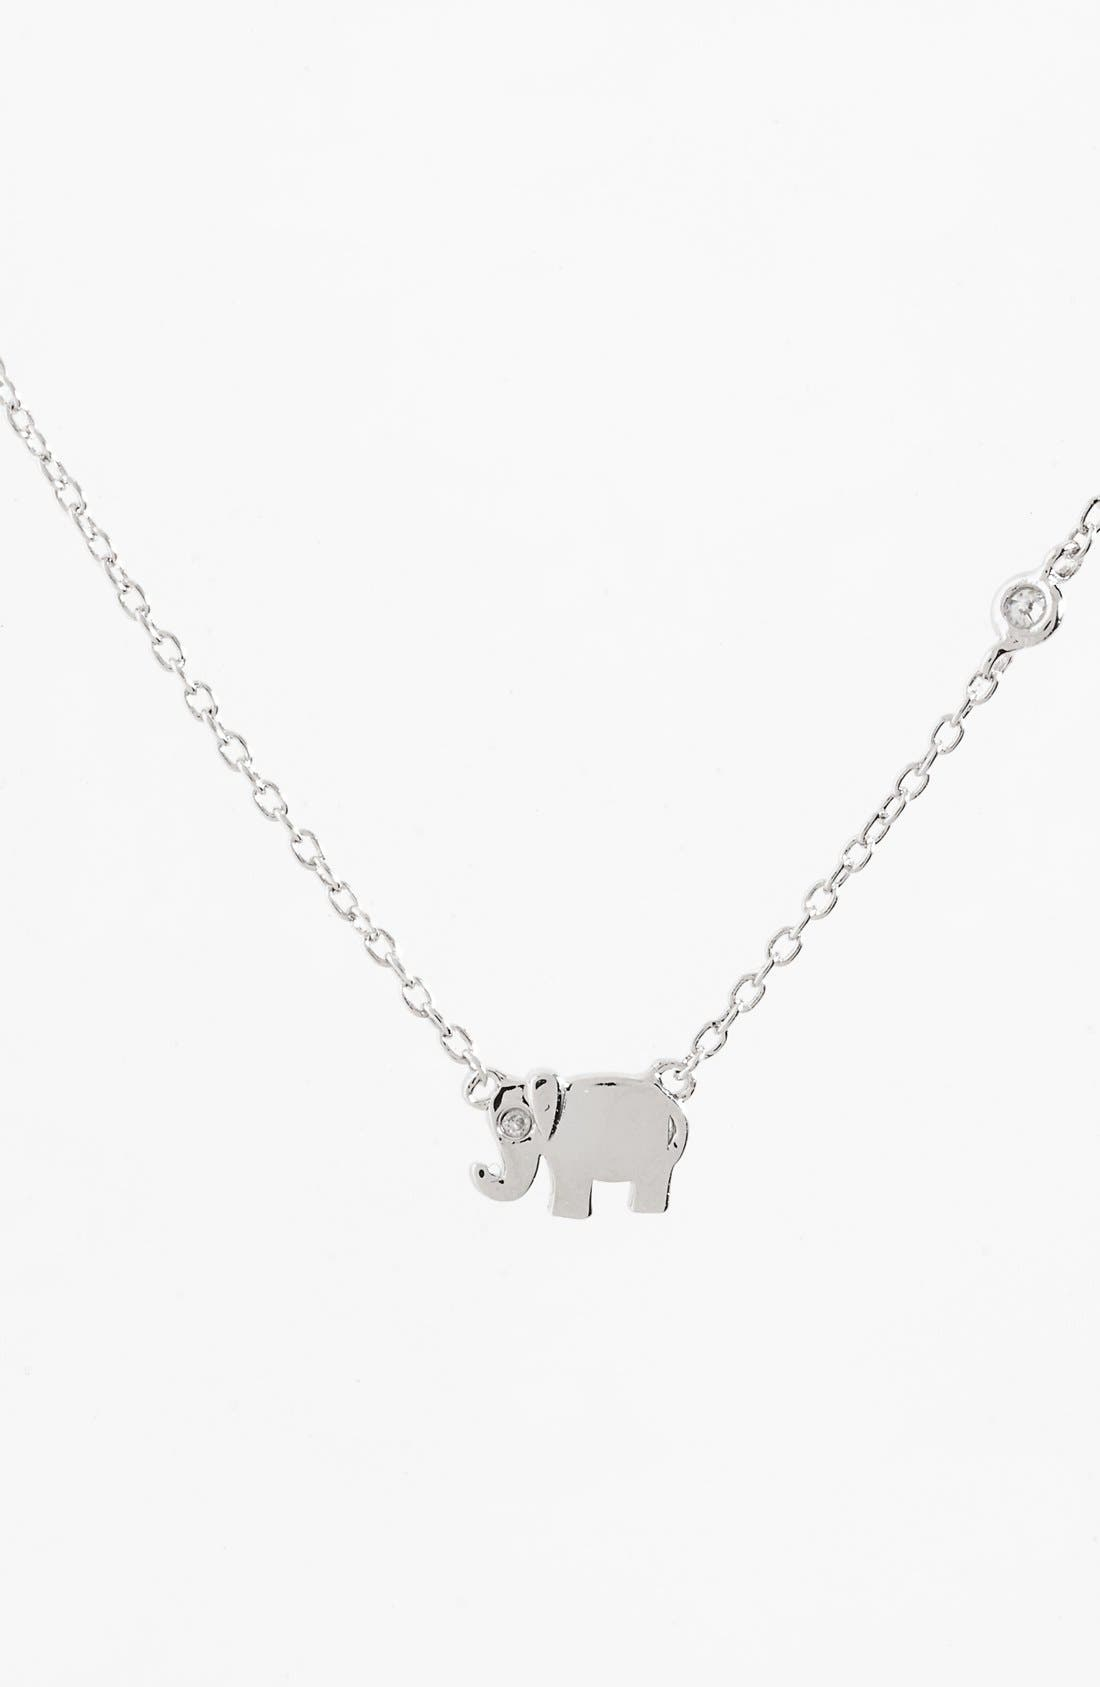 SHY by Sydney Evan Elephant Necklace